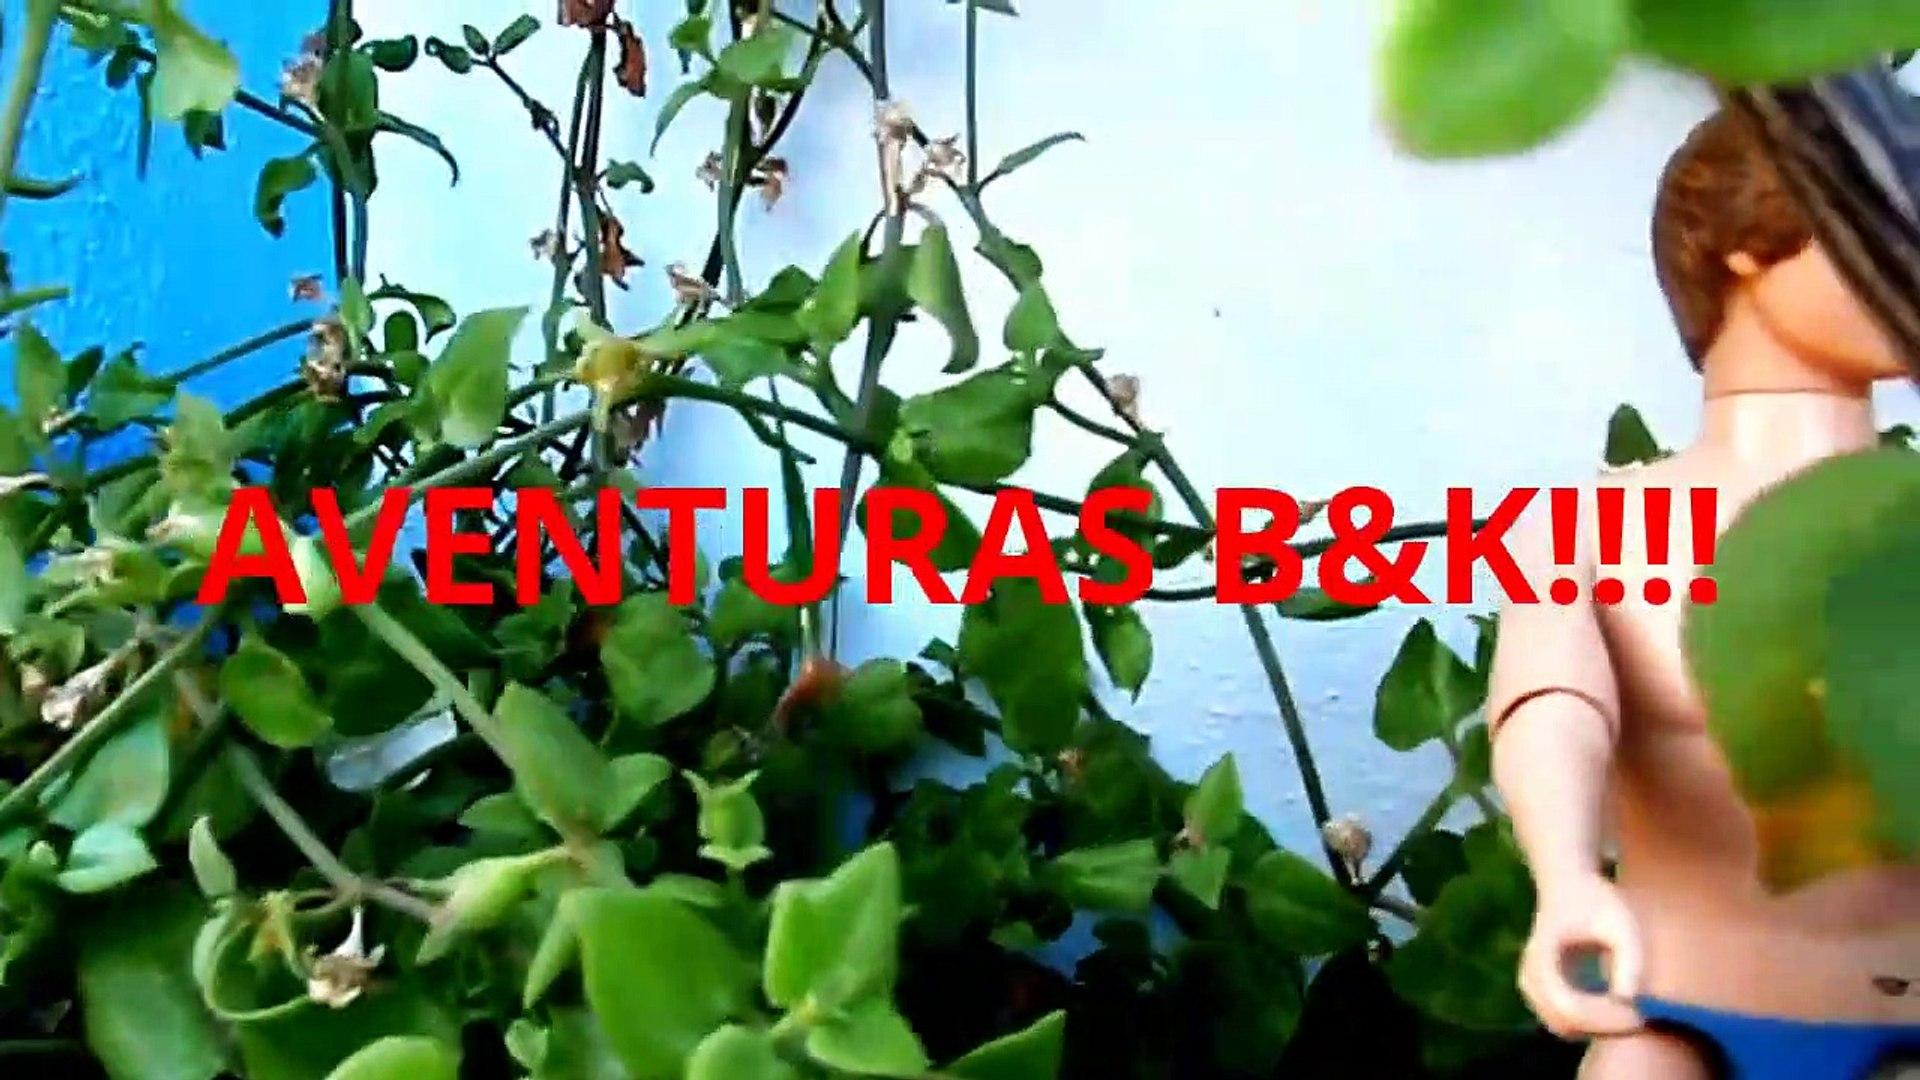 Presentación nueva SERS B&K!!!  B&K Episodes!!!-N7xA29sAymQ